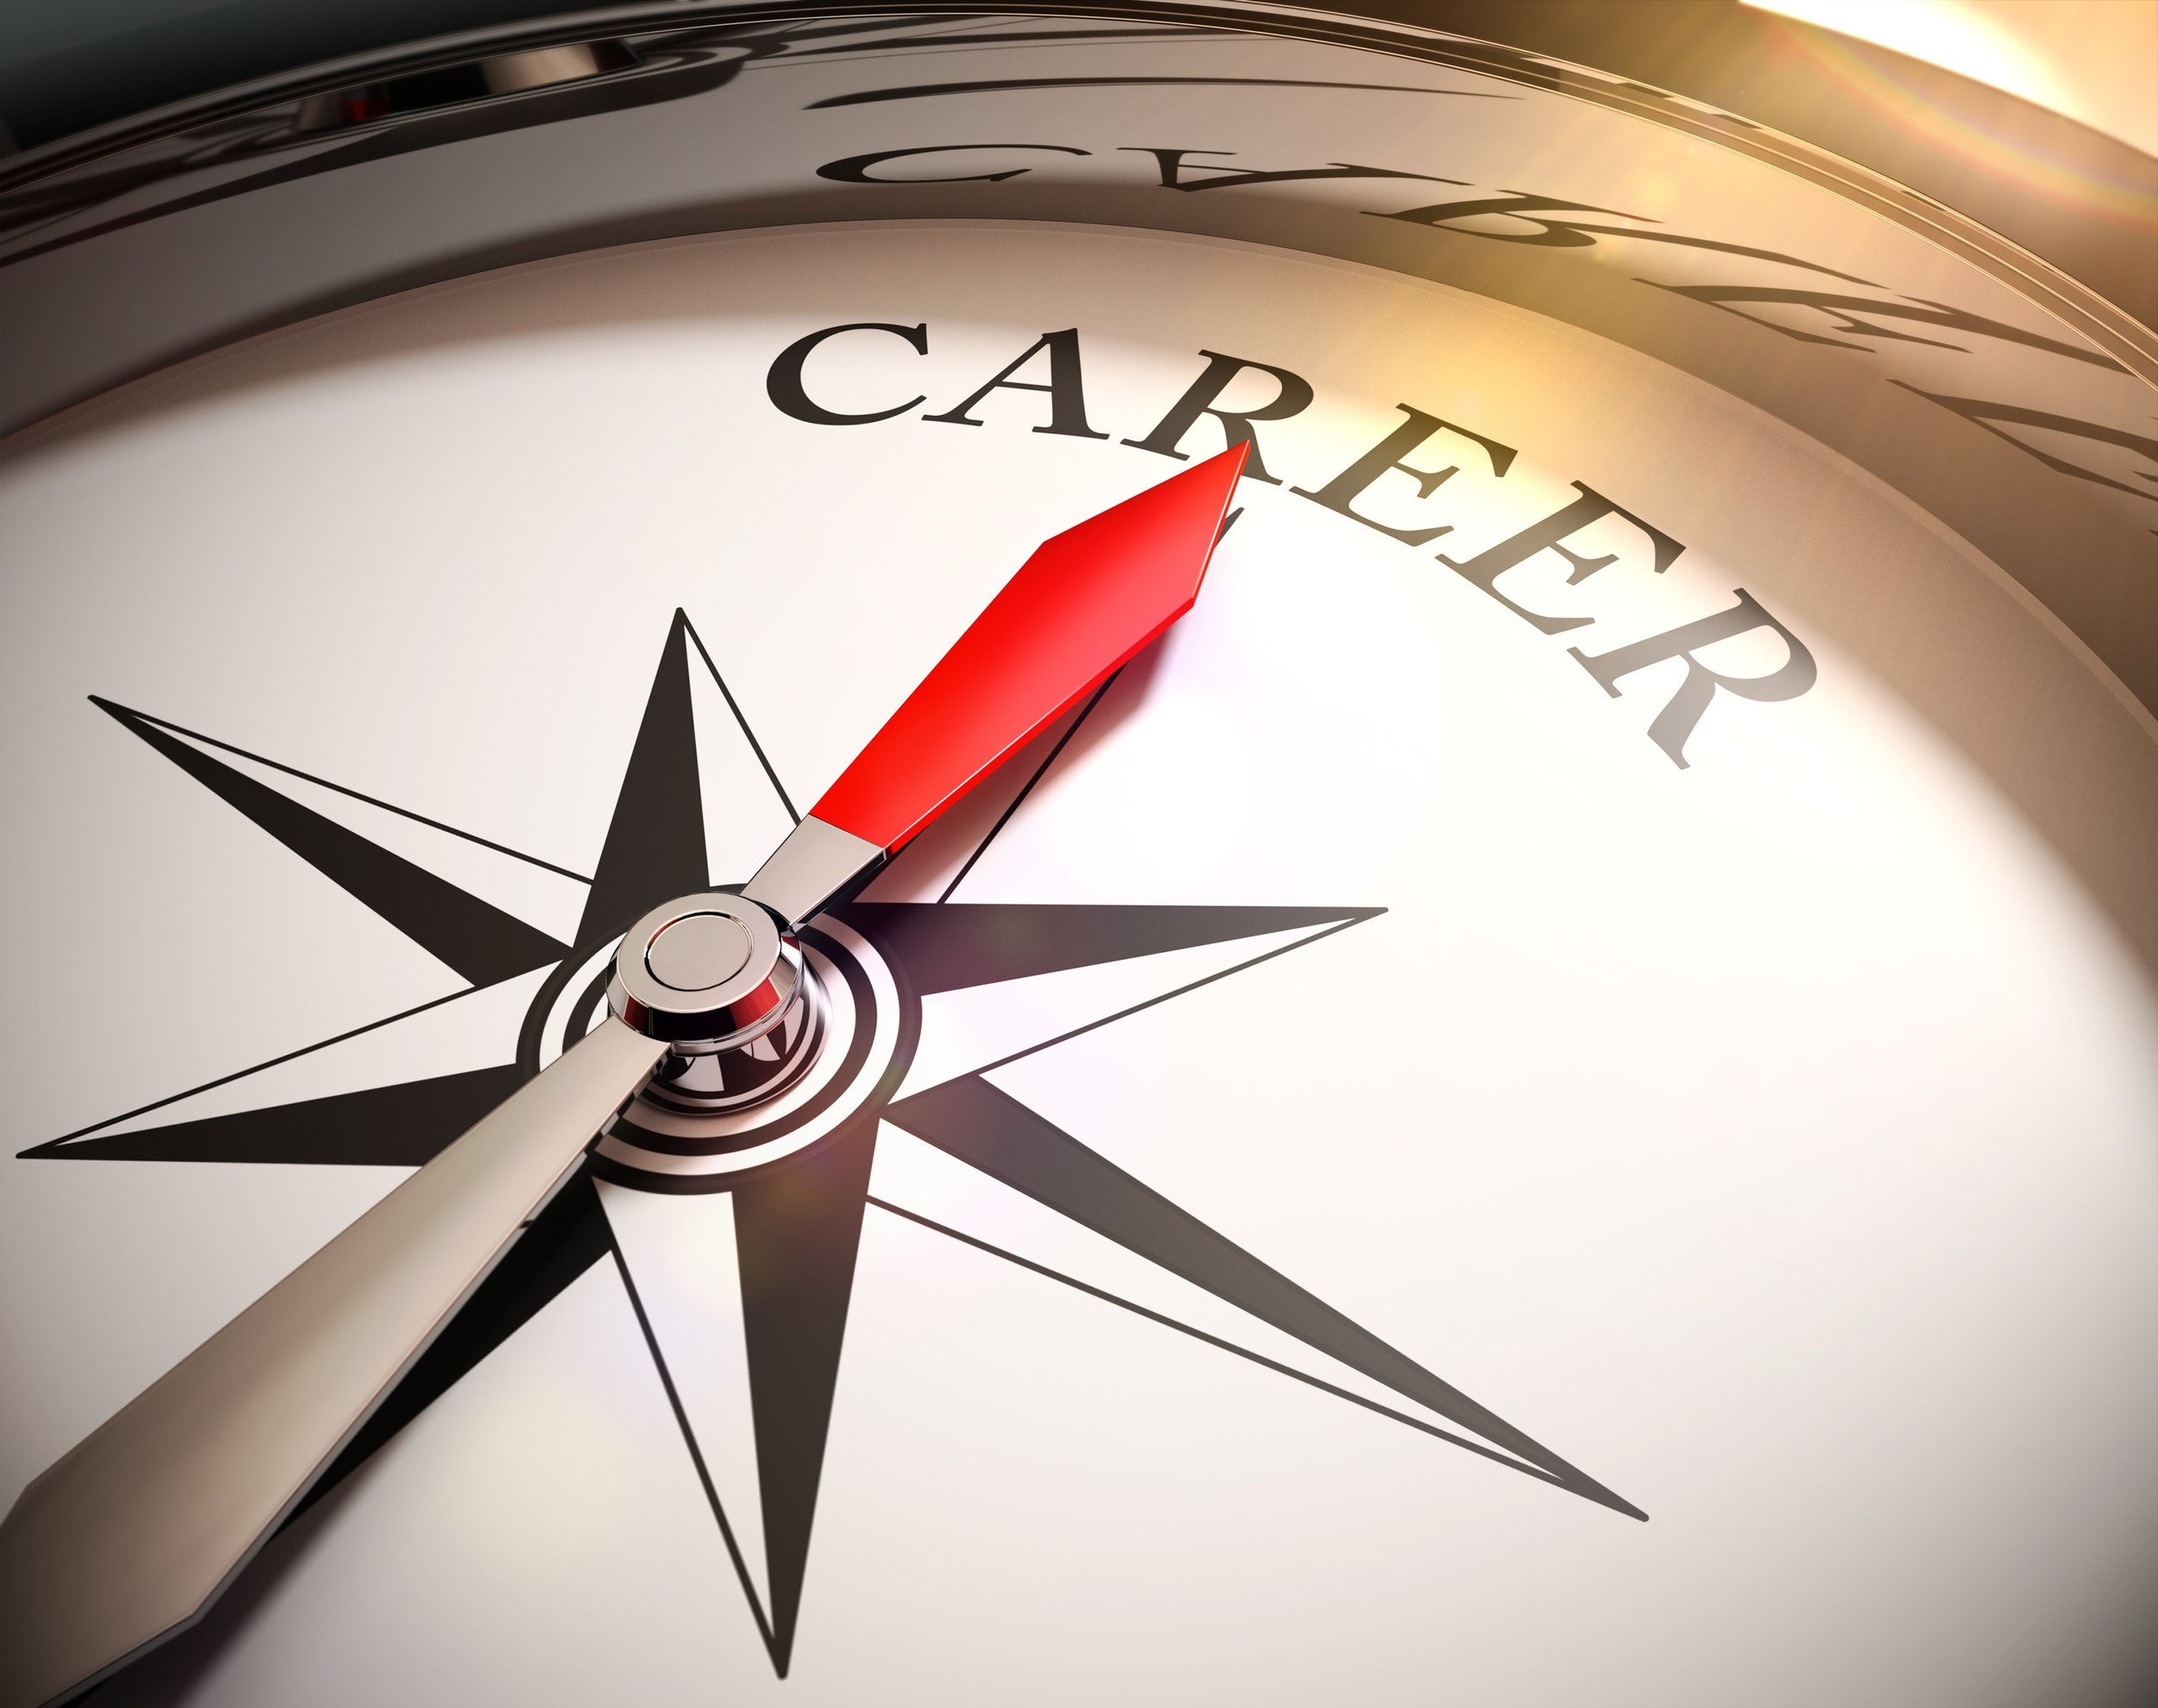 Career Compass CC0, Korry Franke Keynote Image 4